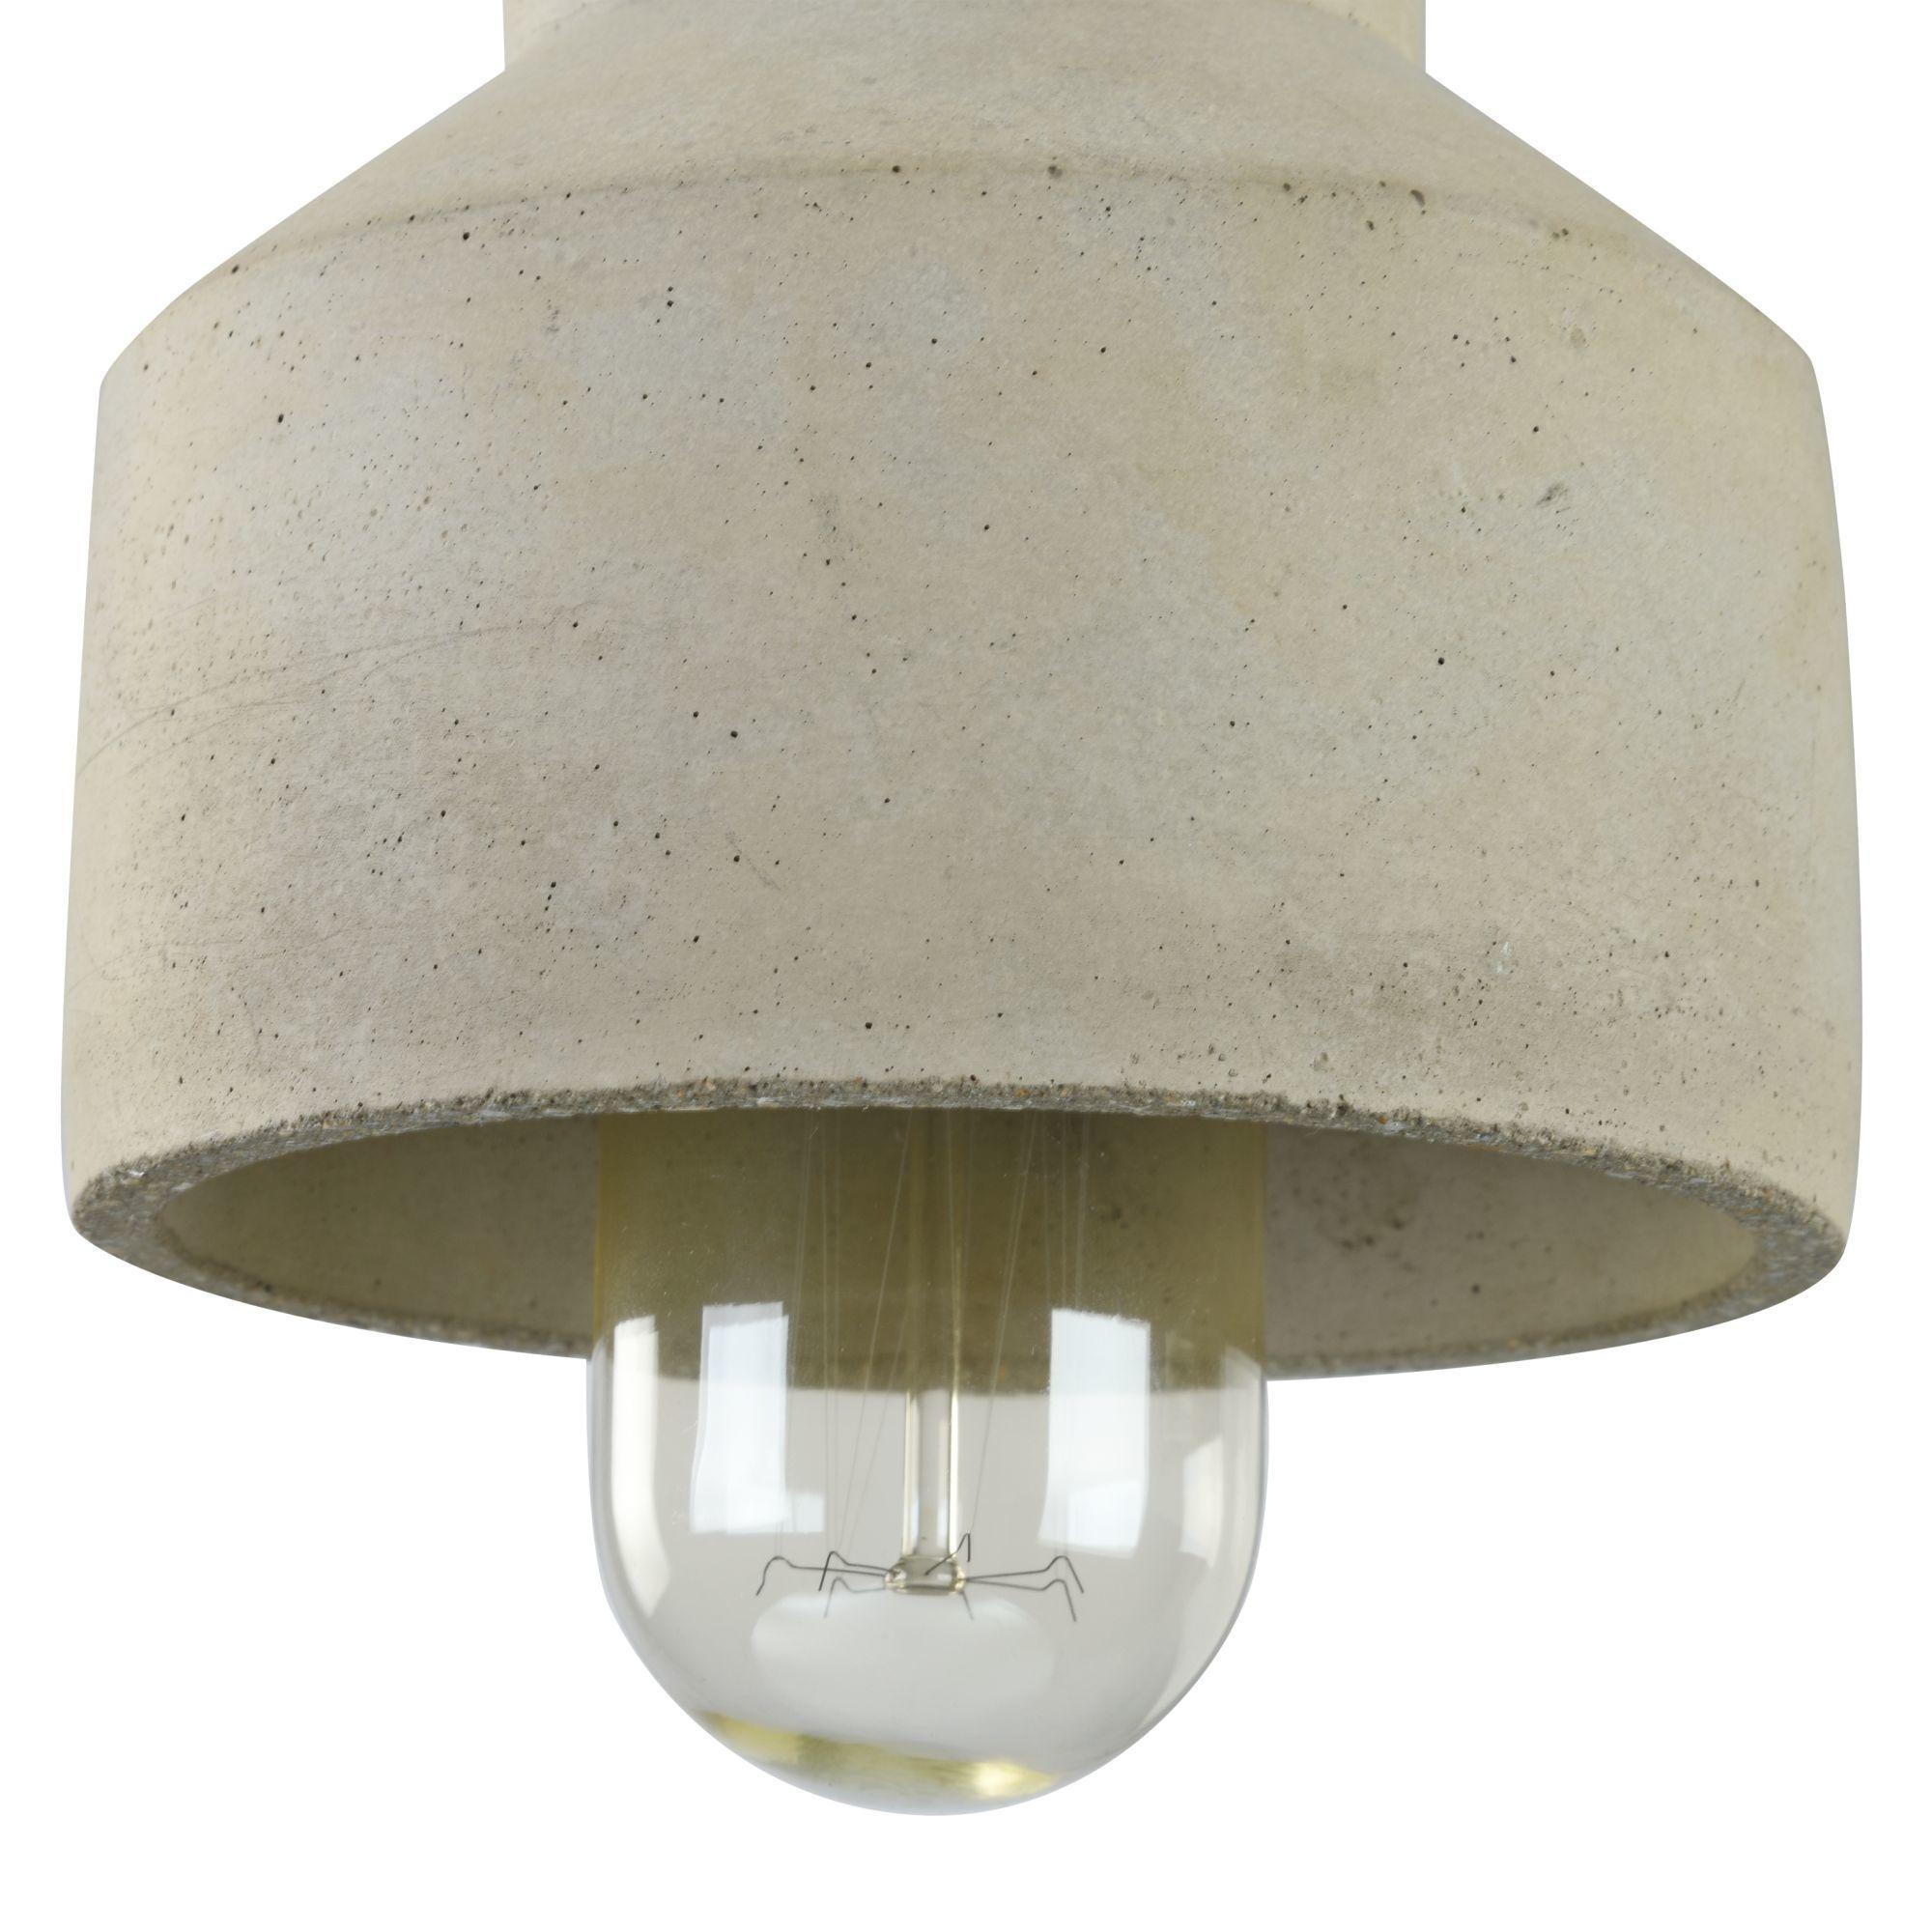 Подвесной светильник Maytoni Broni T437-PL-01-GR, 1xE27x60W, черный, серый, металл, бетон - фото 7